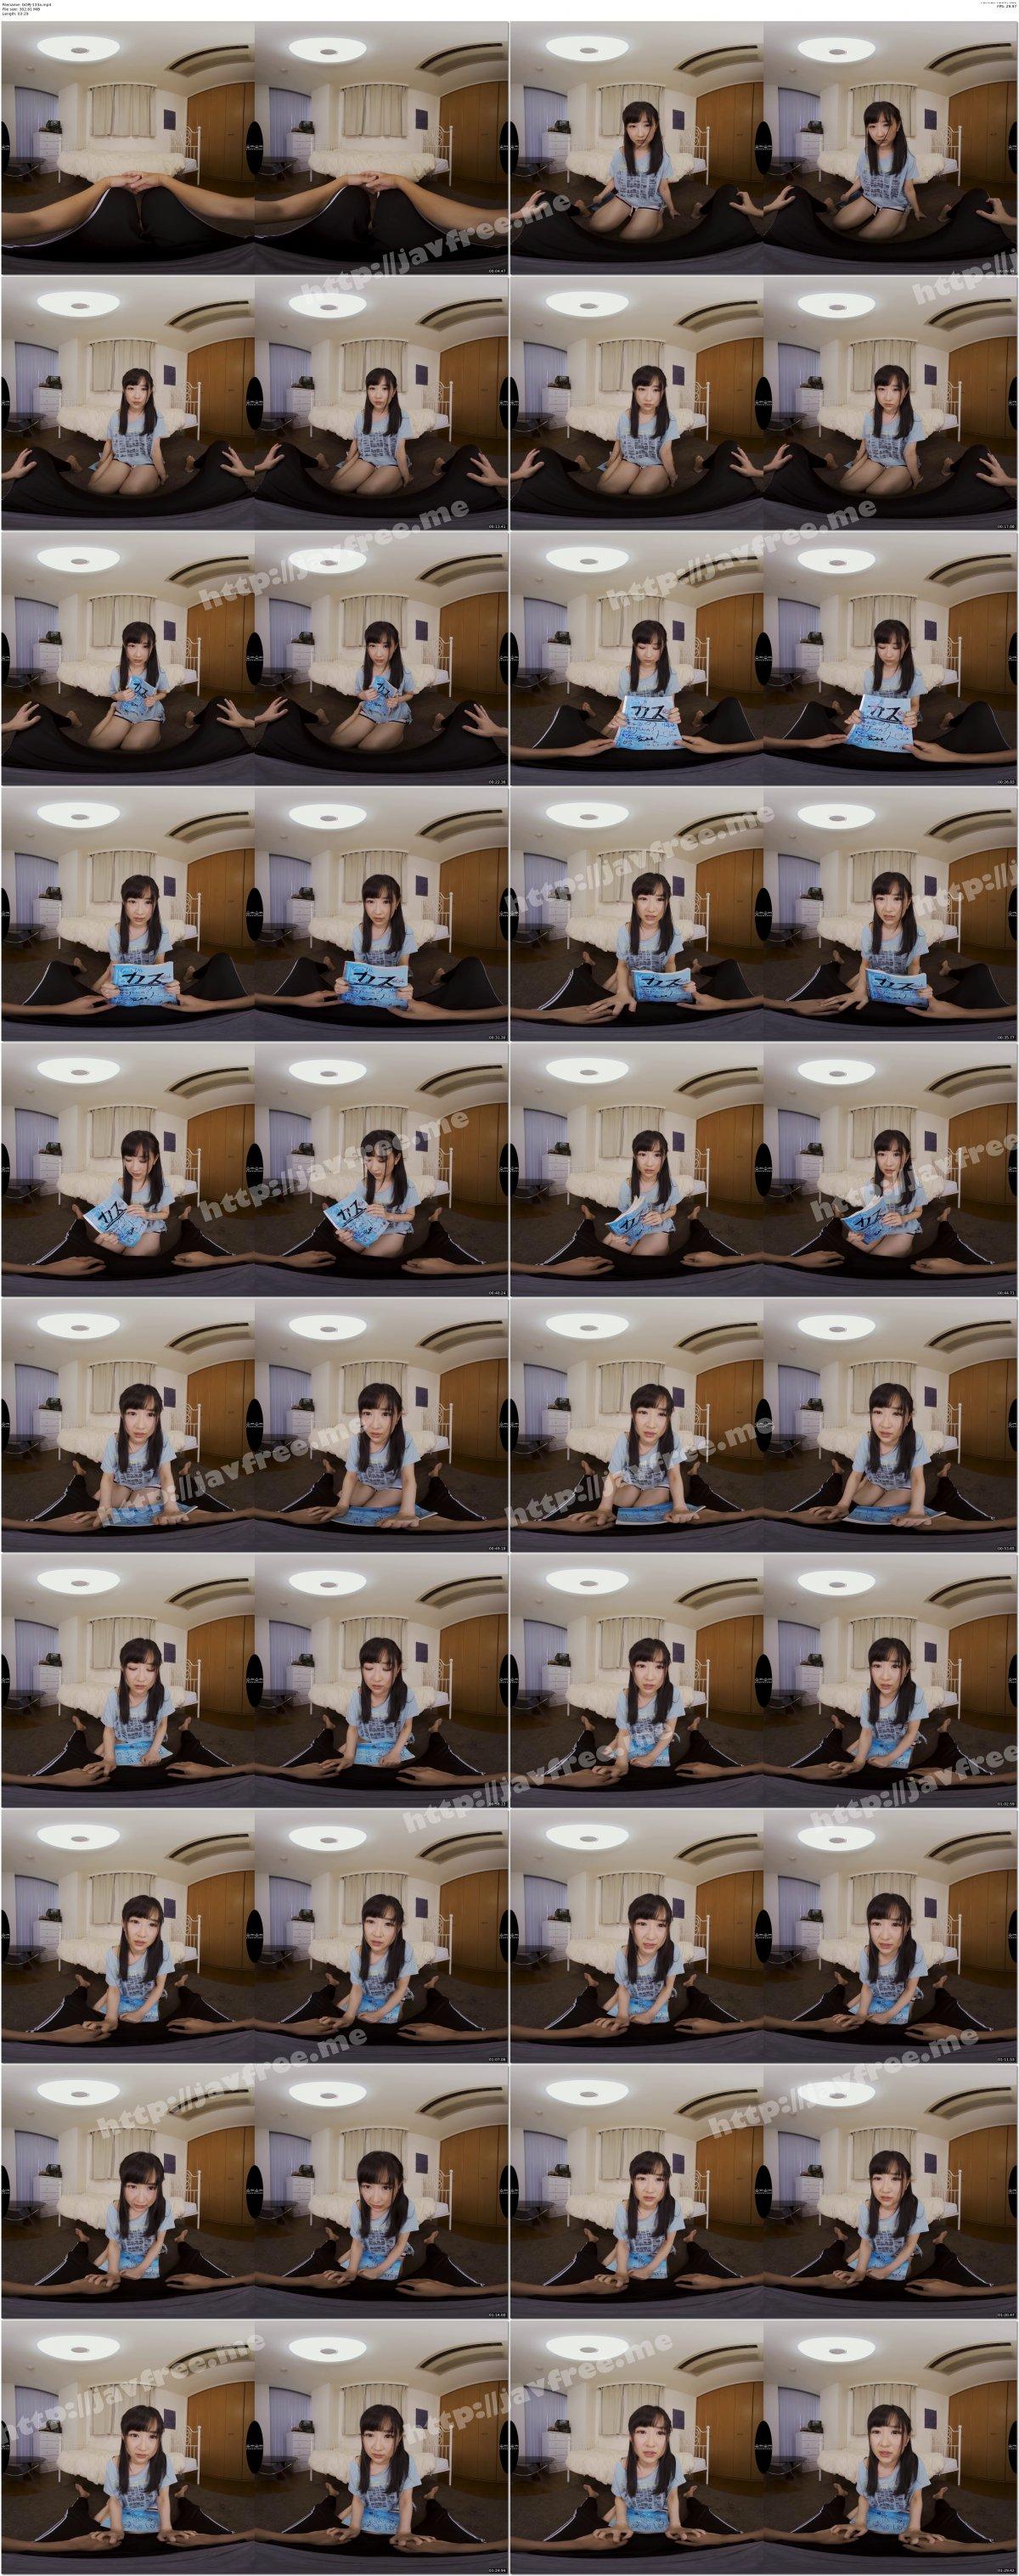 [GOPJ-133] 【VR】劇的高画質 「1度、1度だけ言う事聞くから…!もう犯さないで…」神坂ひなの - image GOPJ-133a on https://javfree.me